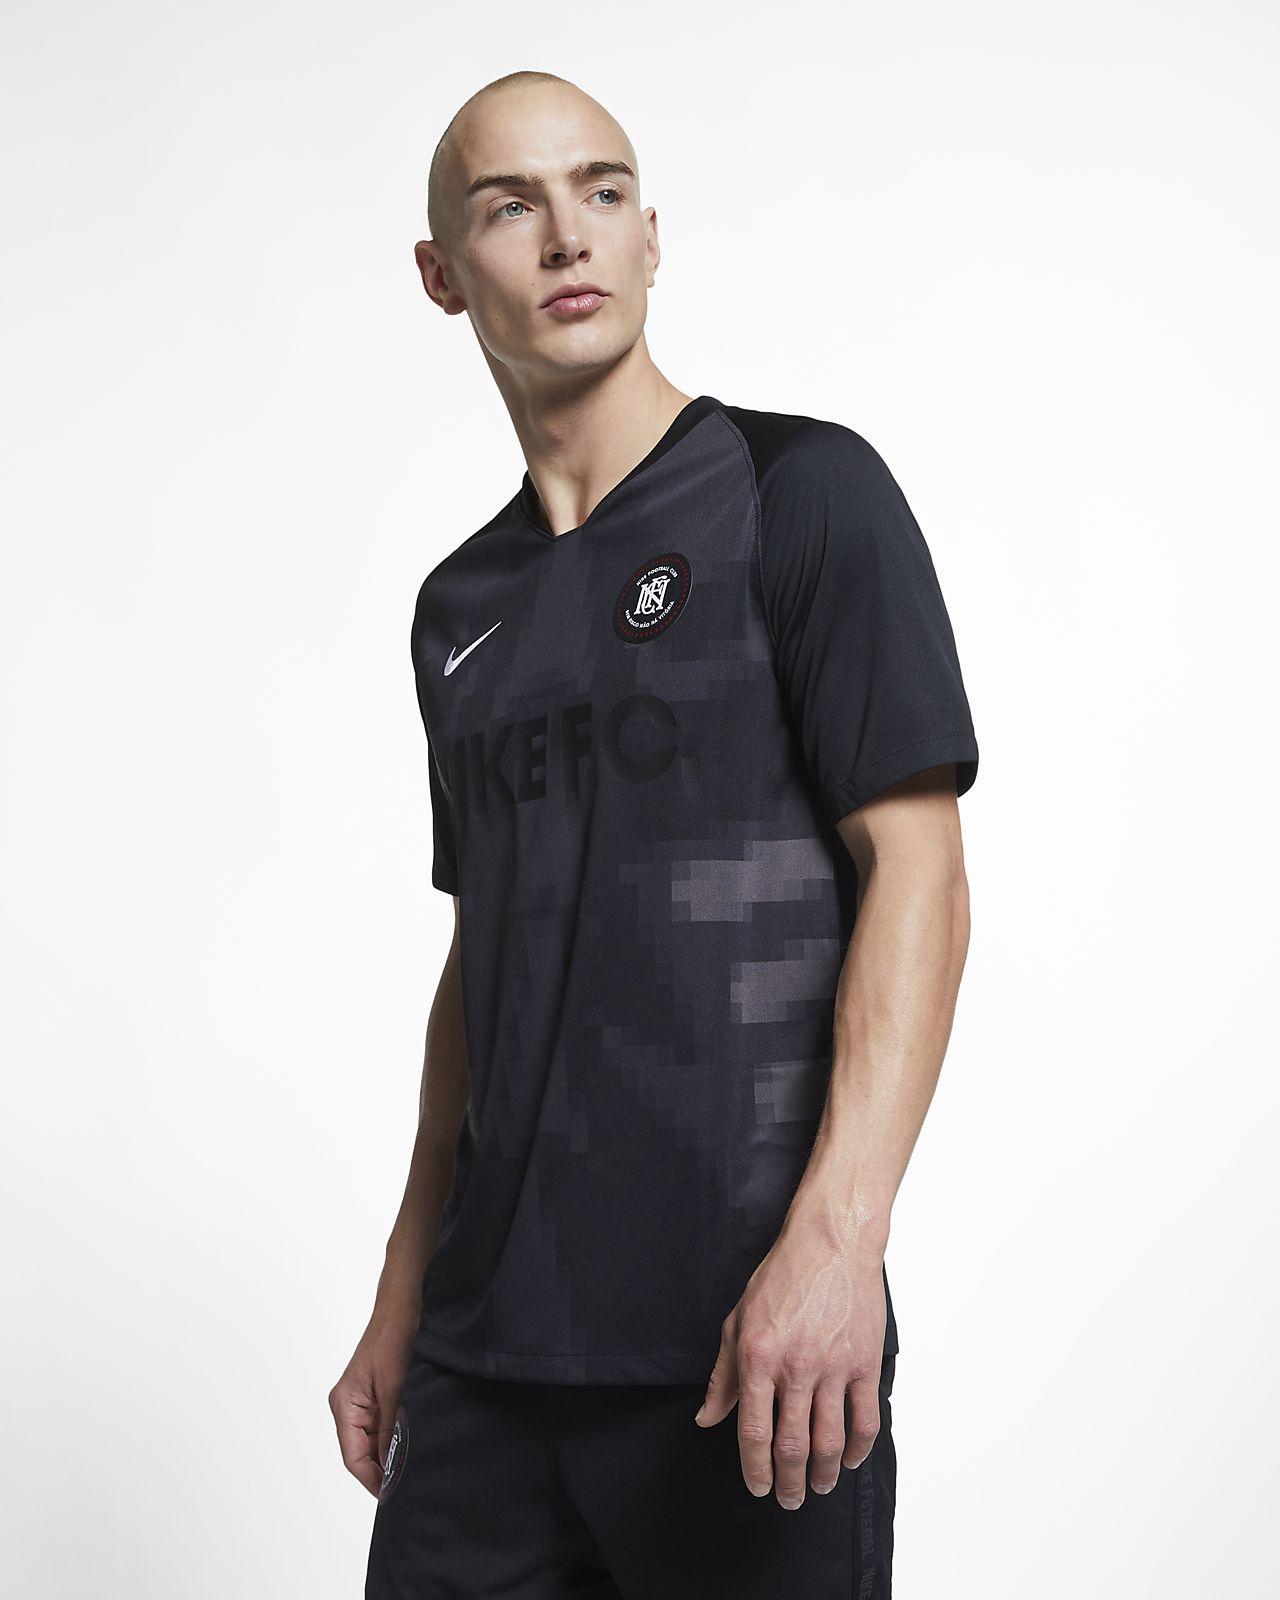 Nike F.C. férfi futballmez